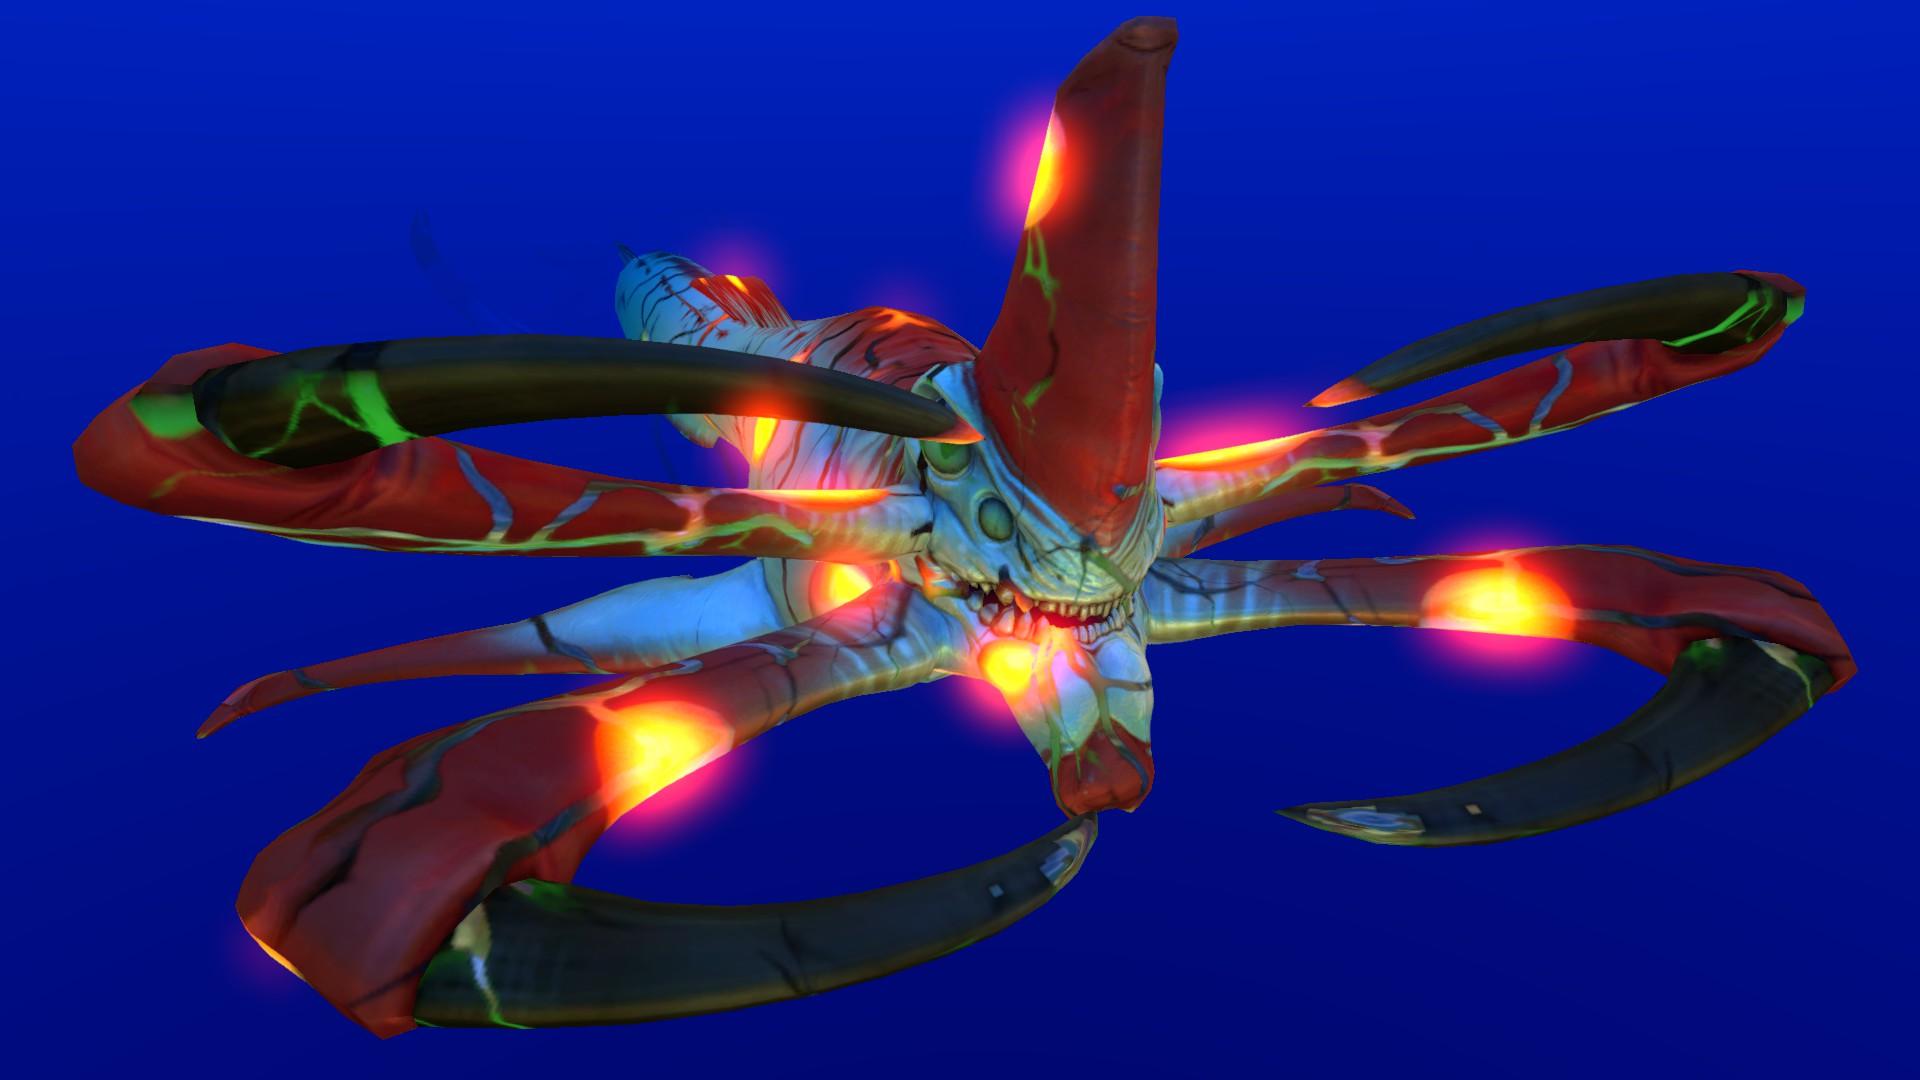 subnautica wiki leviathan - softwaremonster info